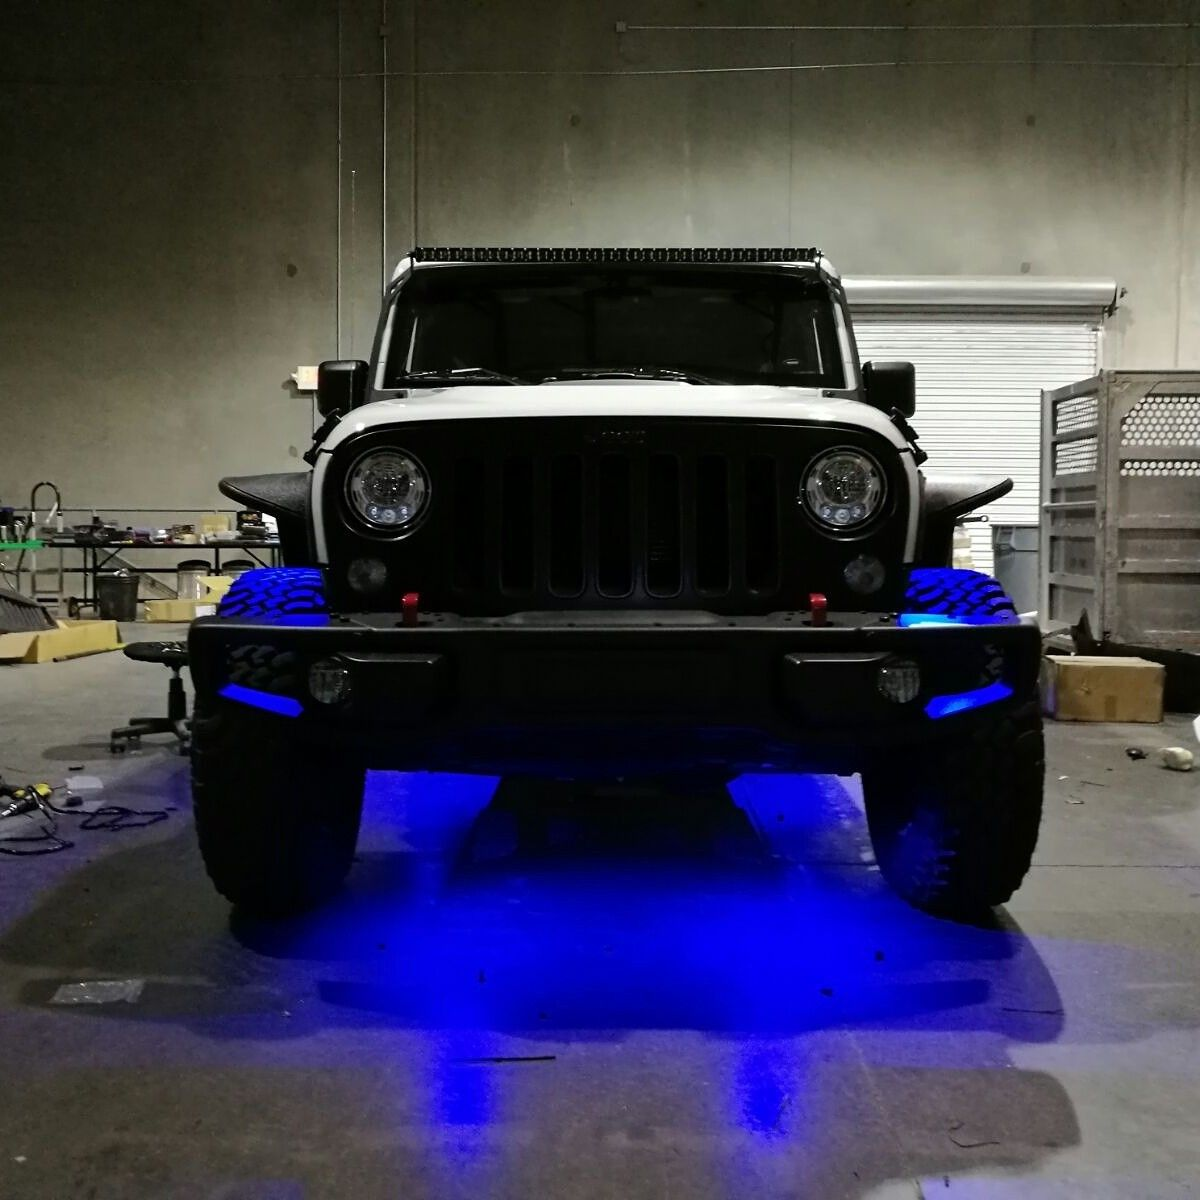 Blue Led Under Body Lights For Jeep Wrangler Jeep Wrangler